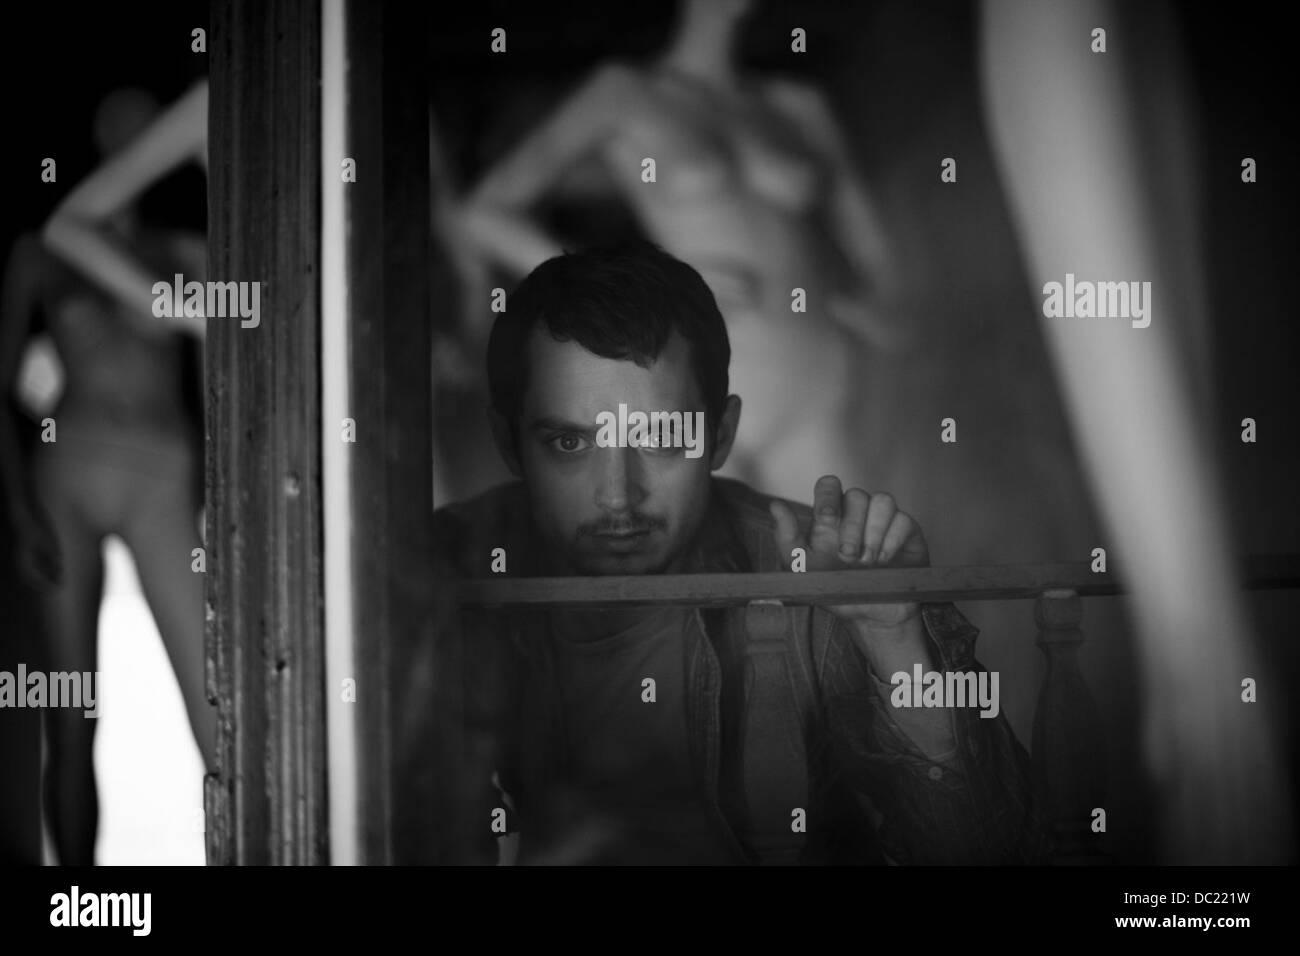 MANIAC (2012) ELIJAH WOOD, FRANCK KHALFOUN (DIR) 008 MOVIESTORE COLLECTION LTD - Stock Image